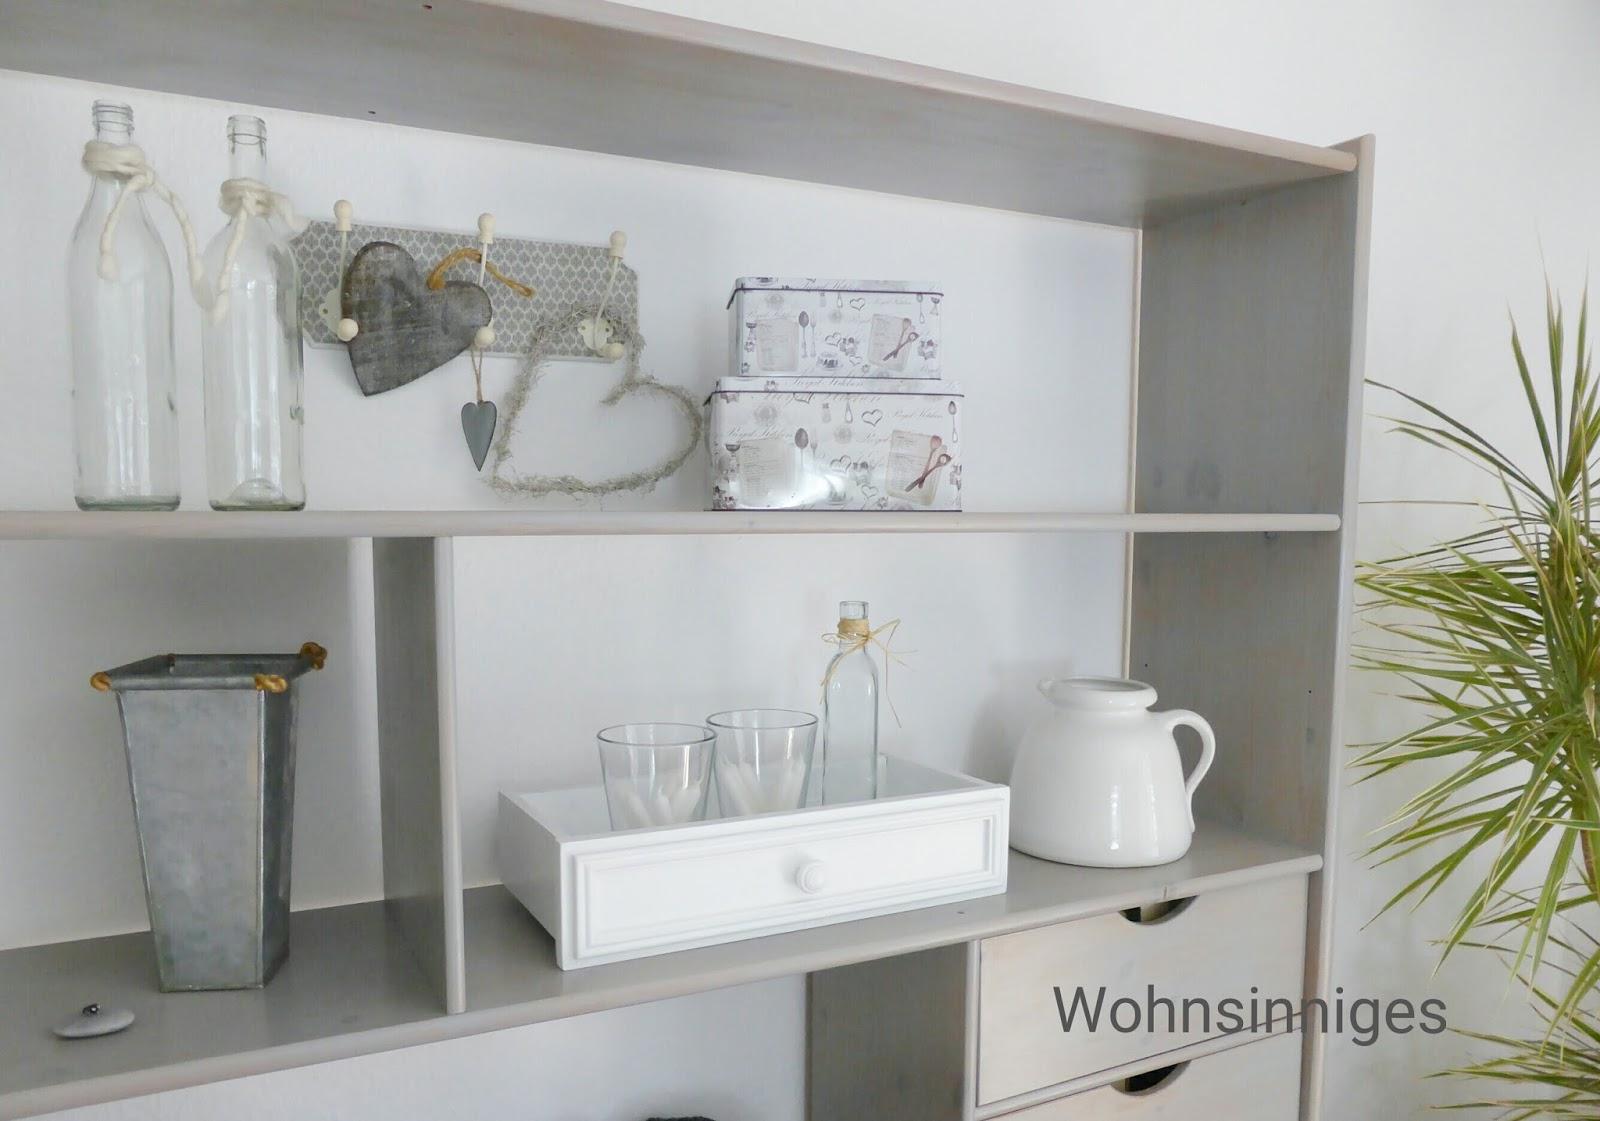 wohnsinniges k chen diy. Black Bedroom Furniture Sets. Home Design Ideas